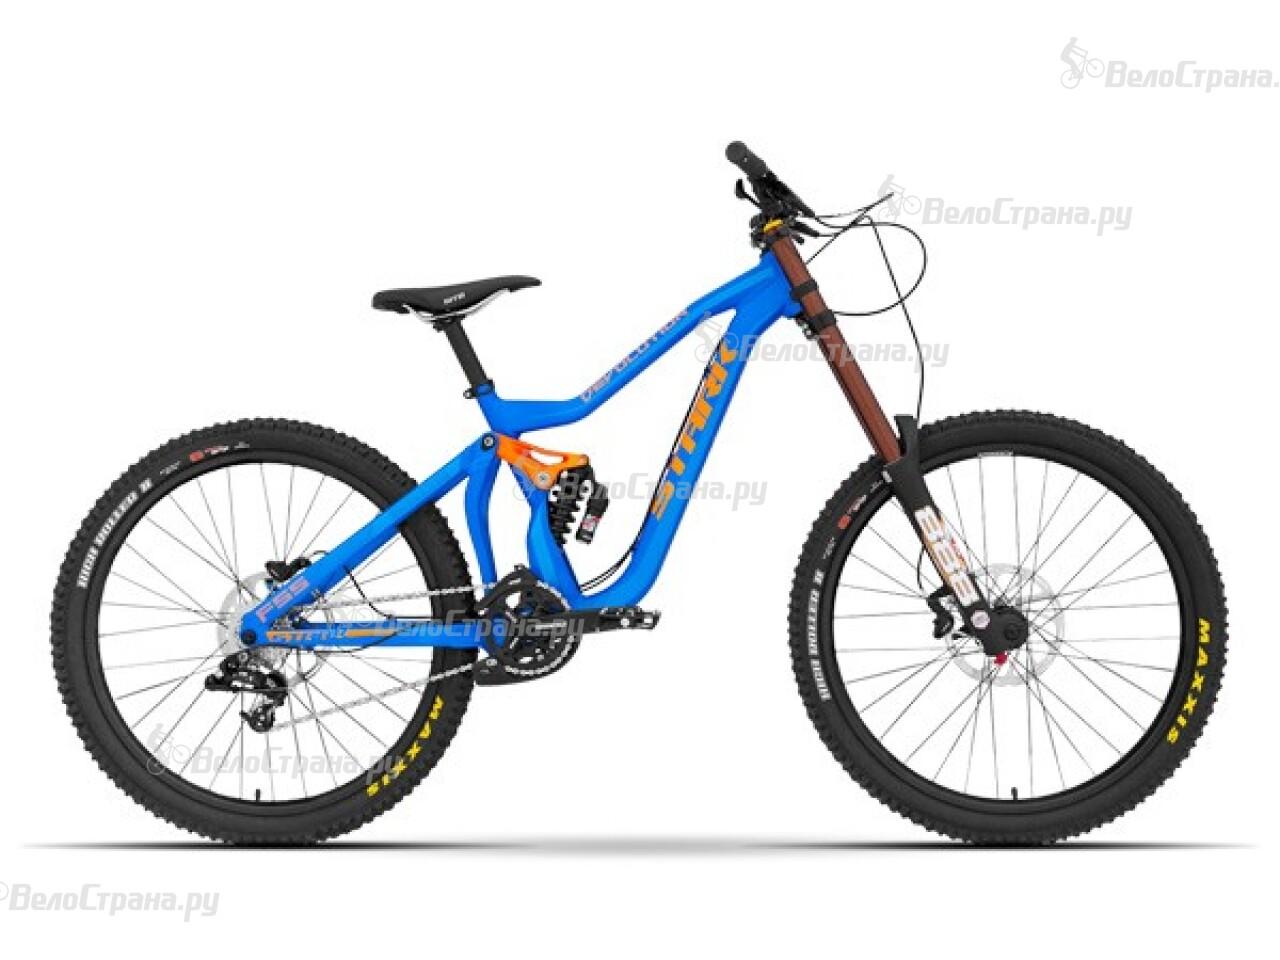 Велосипед Stark Devolution 650B (2015) масляная живопись shenghuayuan b cx0014 b cx0014